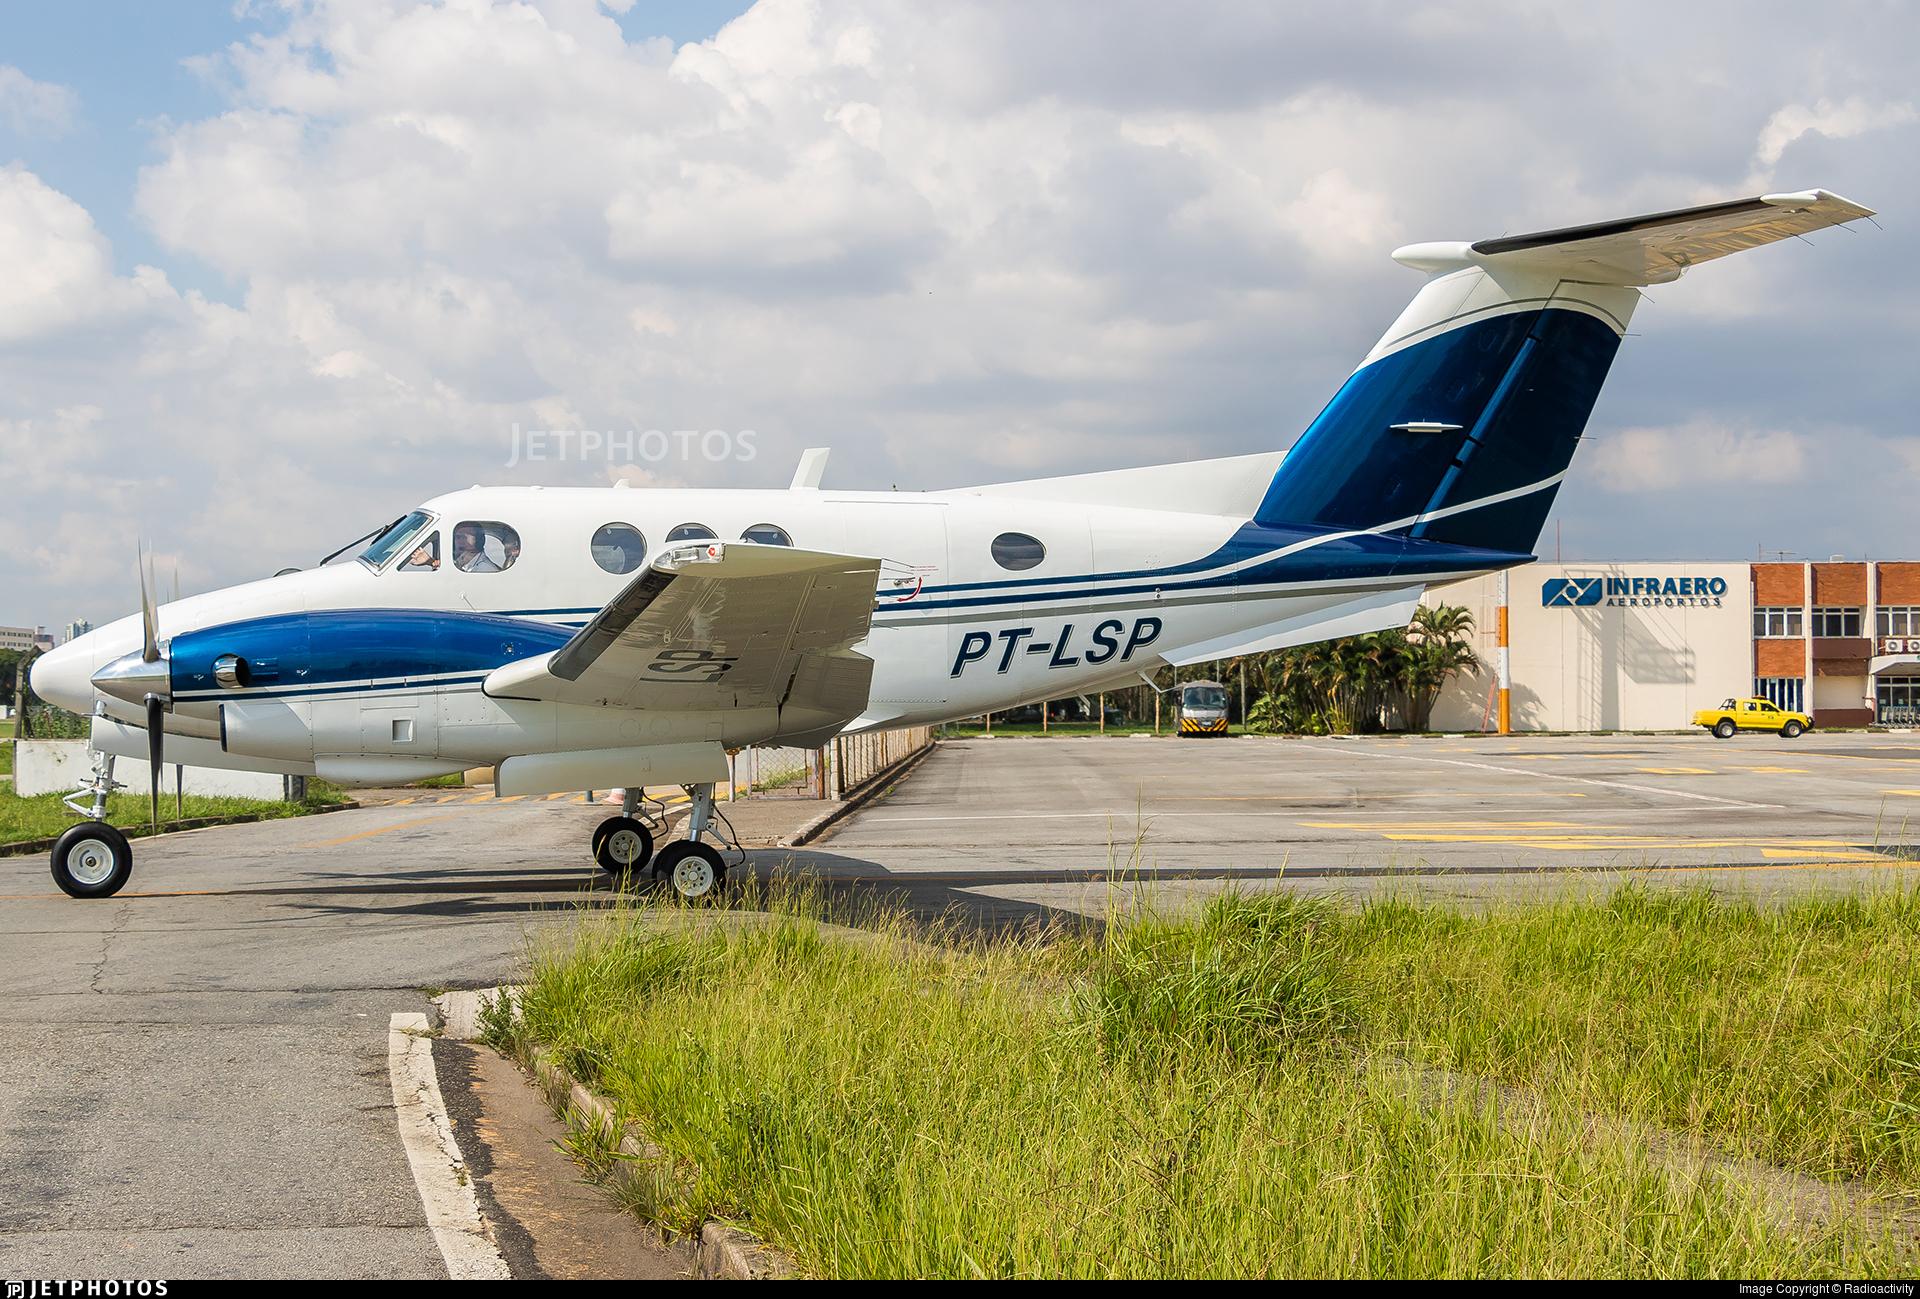 PT-LSP | Beechcraft F90 King Air | Private | Radioactivity | JetPhotos